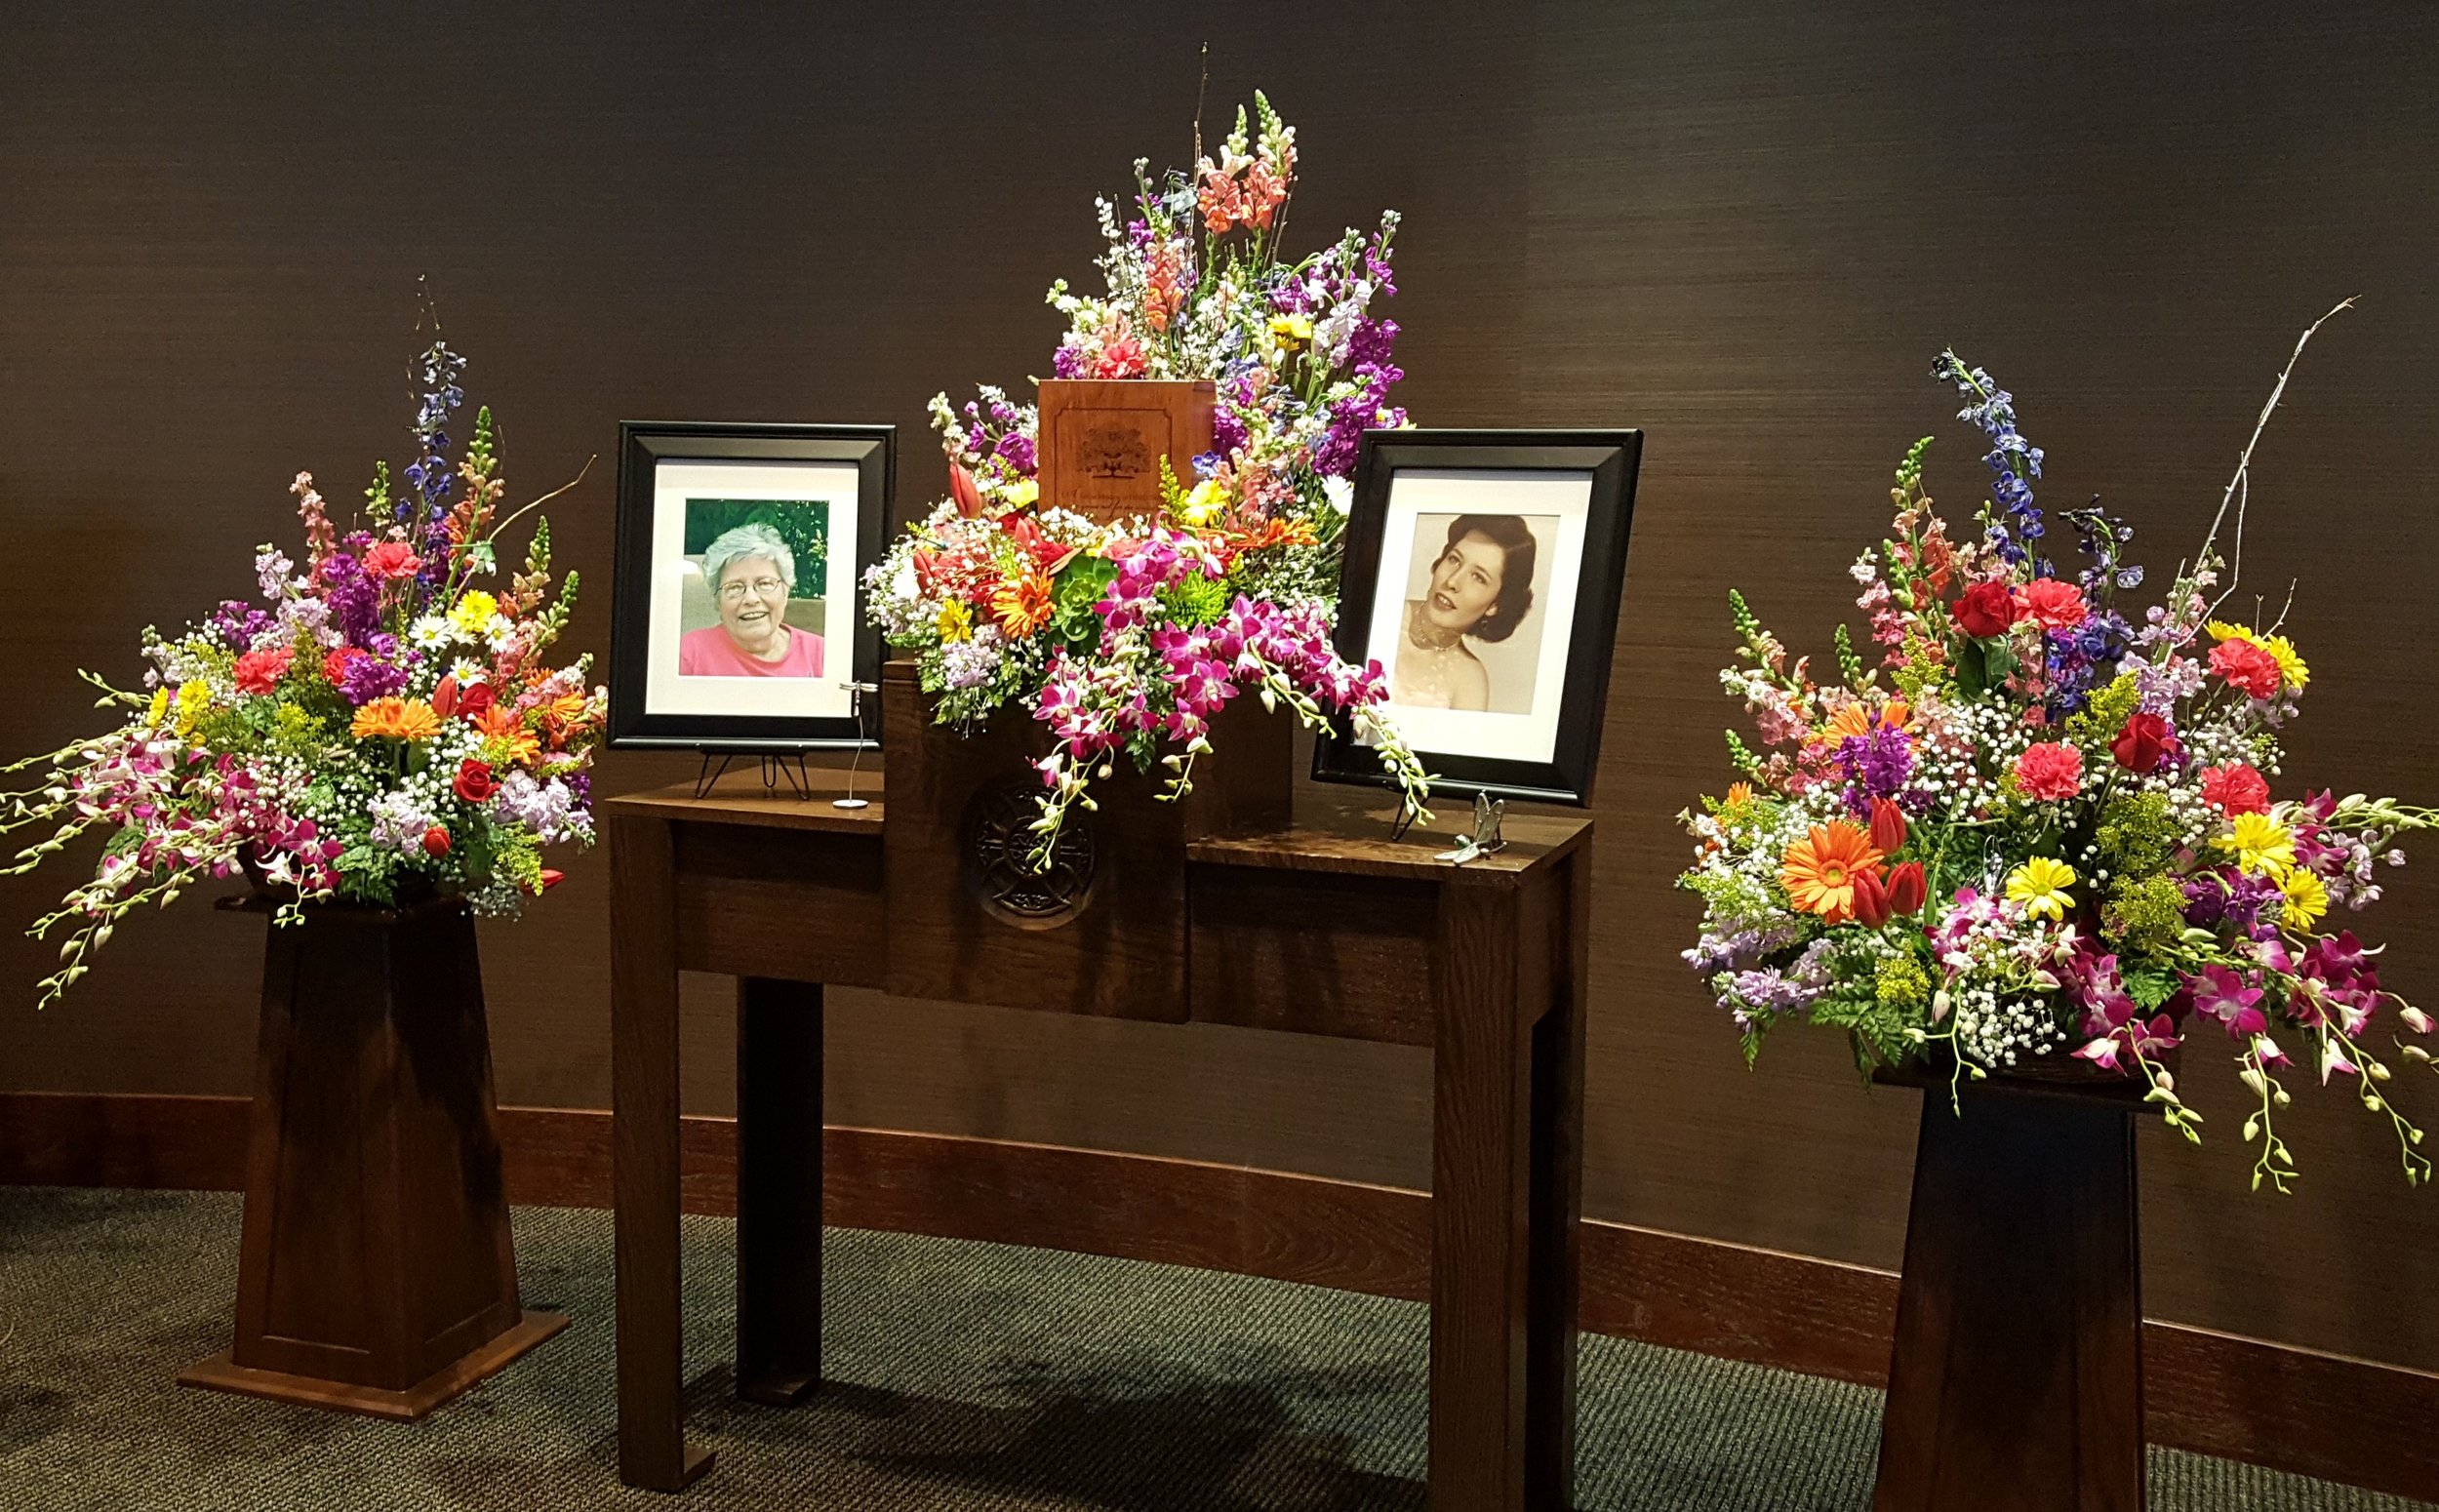 Floral arrangements with urn